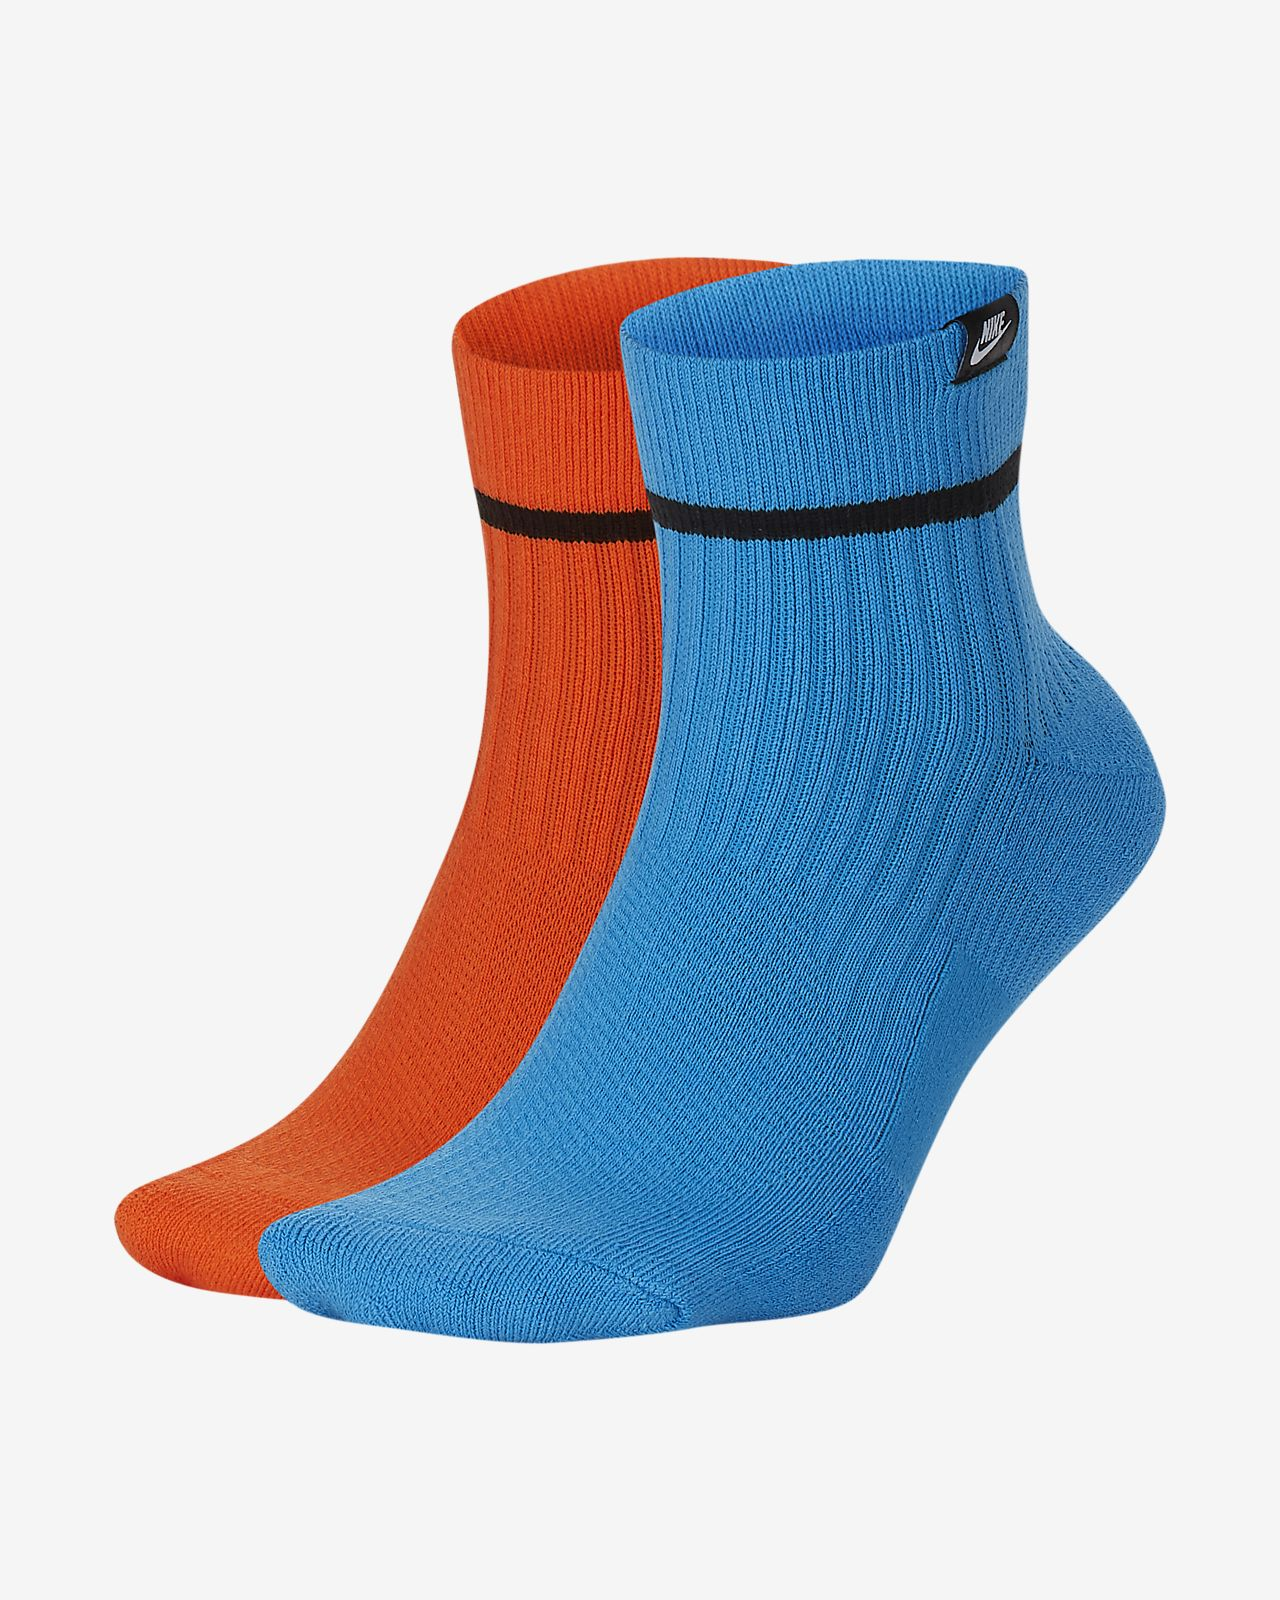 Nike SNEAKR Sox Enkelsokken (2 paar)